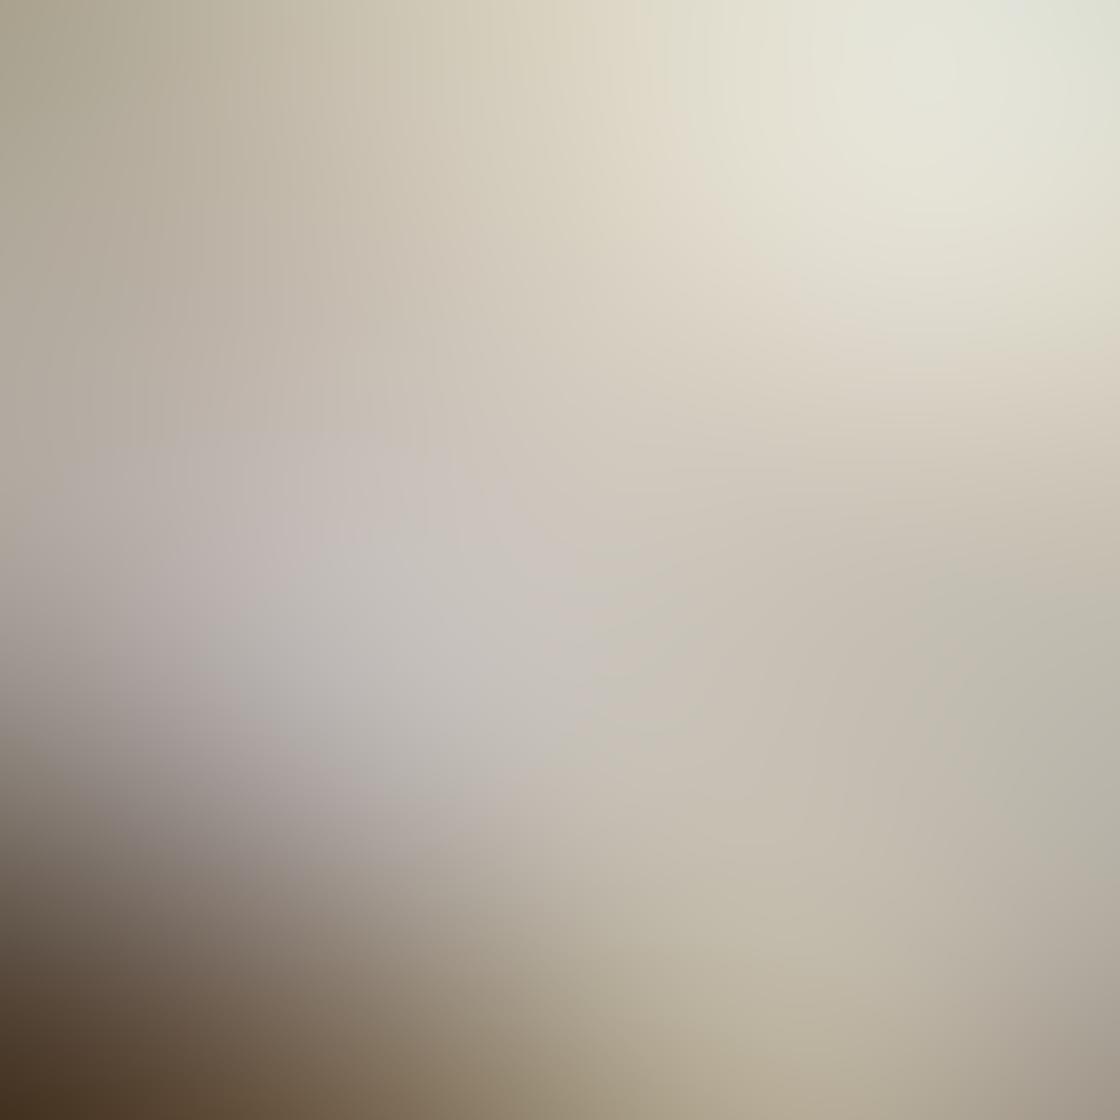 Kelly Tan iPhone Photos 11